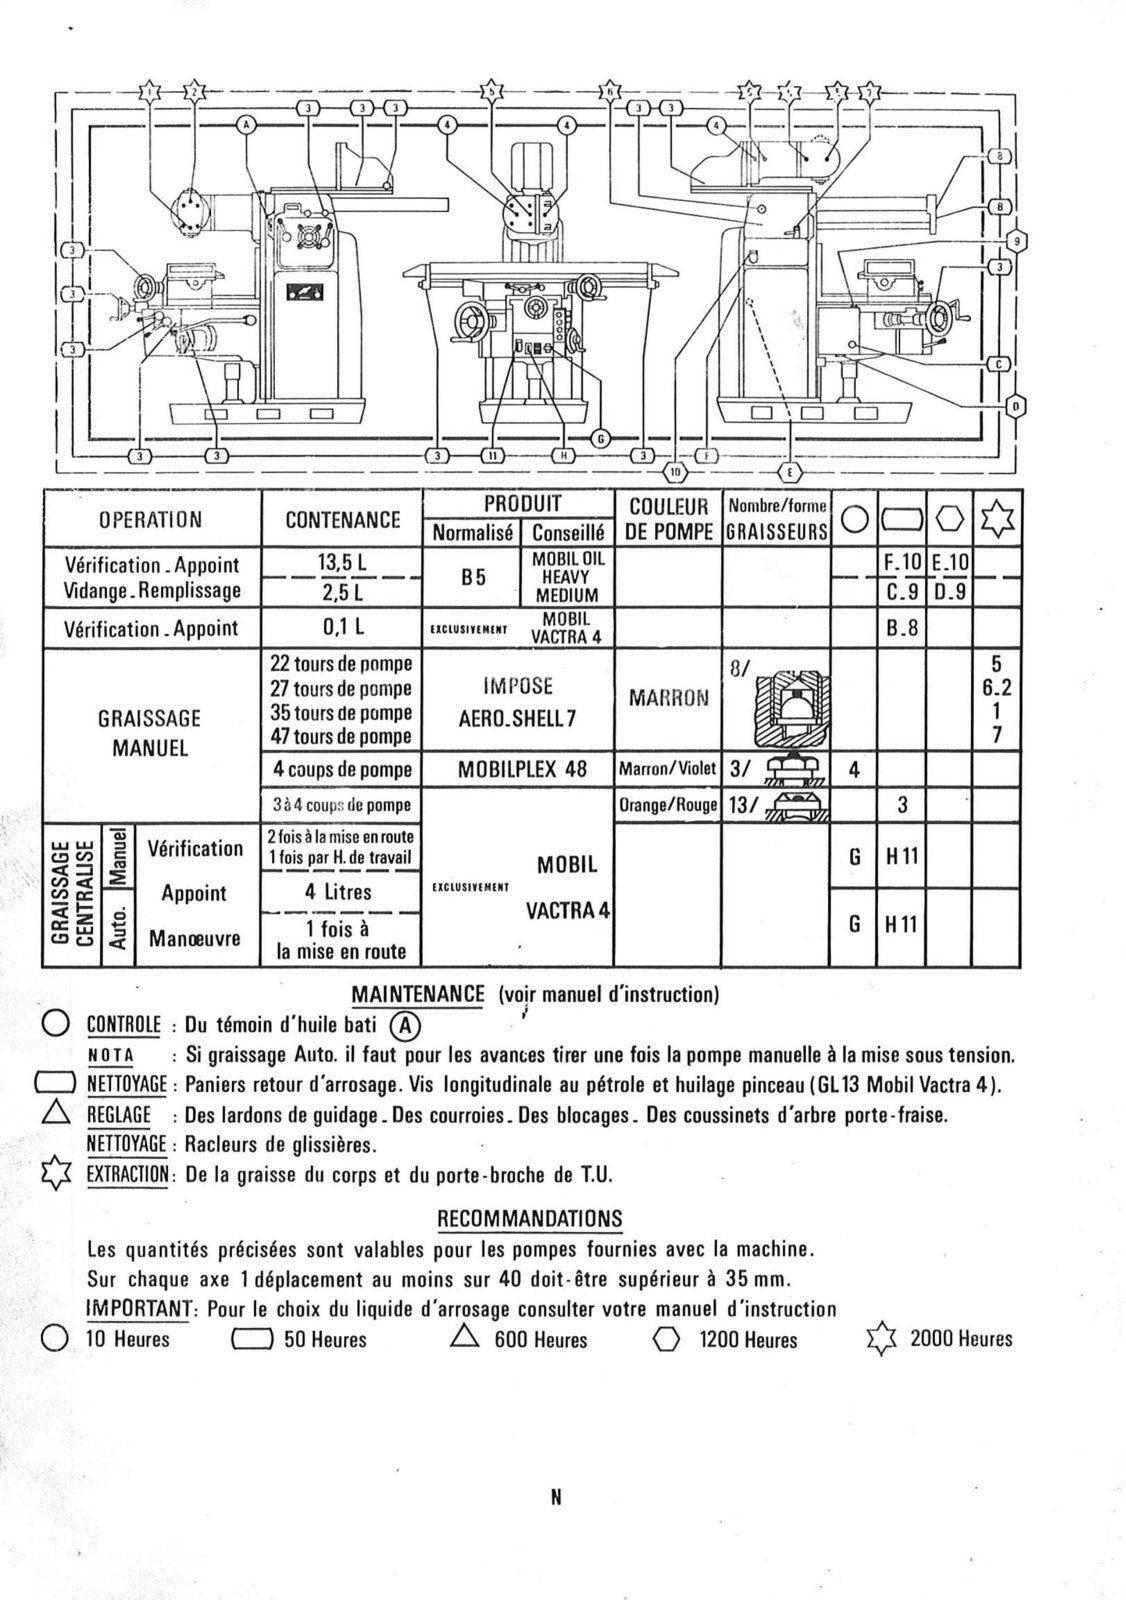 Dufour221 plan graissage .jpg